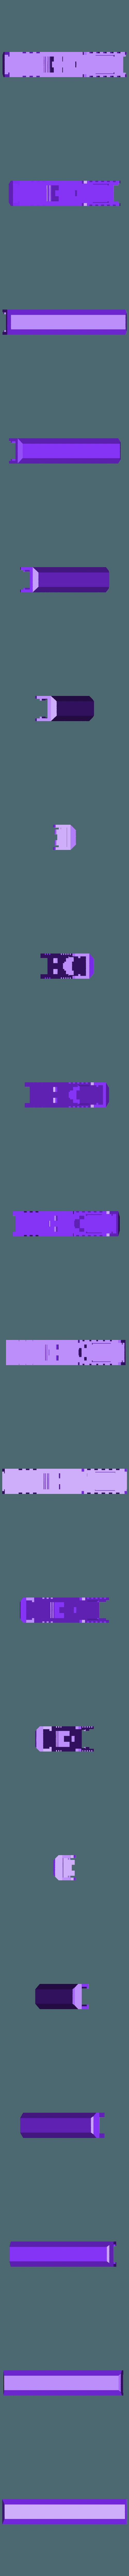 OfficeGun_upper.stl Télécharger fichier STL gratuit glock/gun/pistol • Modèle à imprimer en 3D, billy-and-co